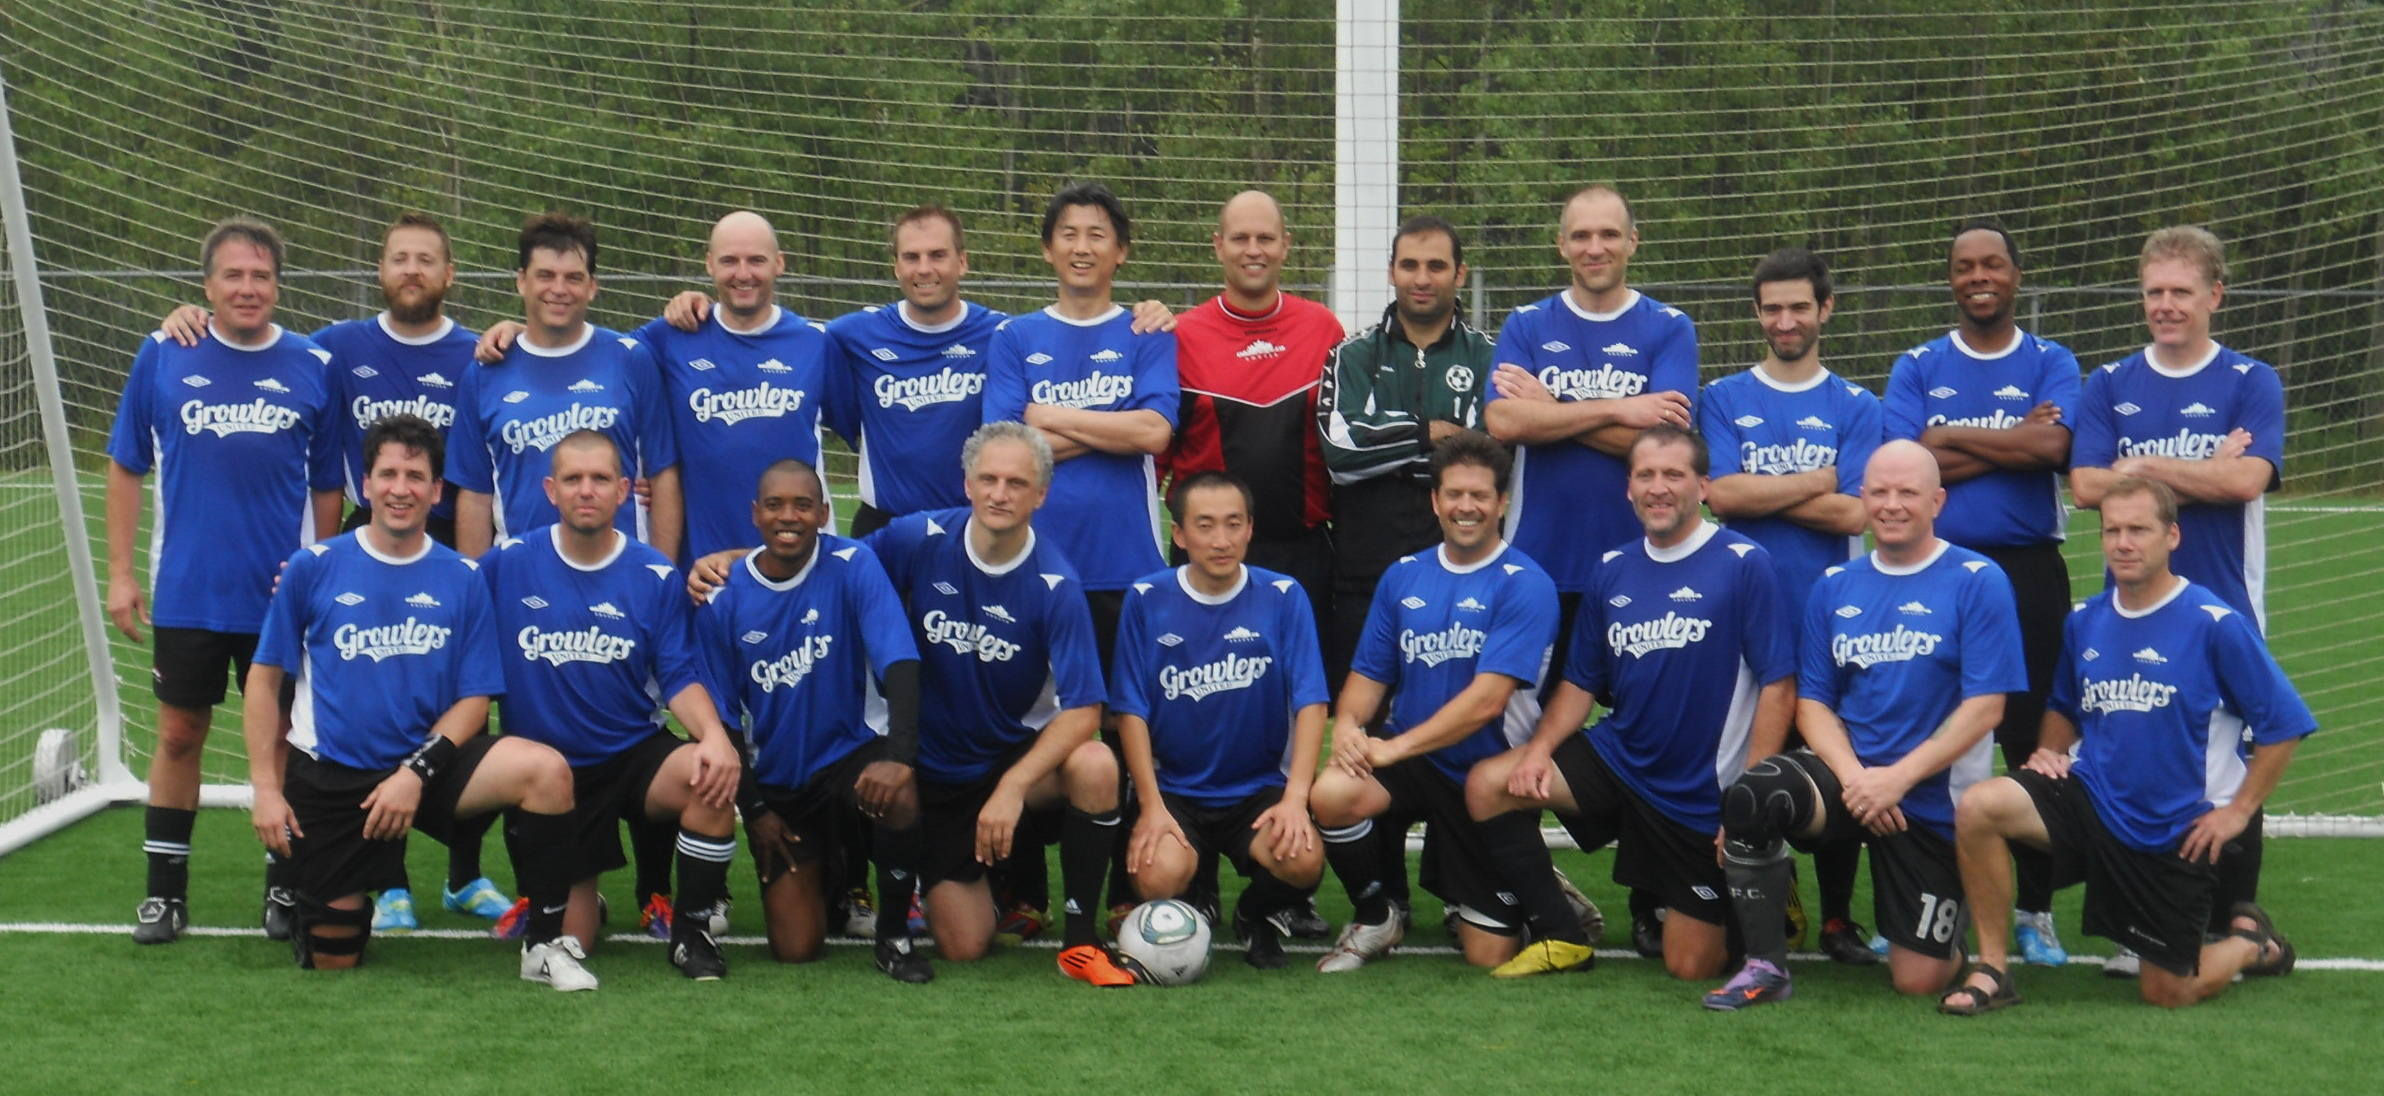 Old Boys' Soccer Club 2011 Prov Team